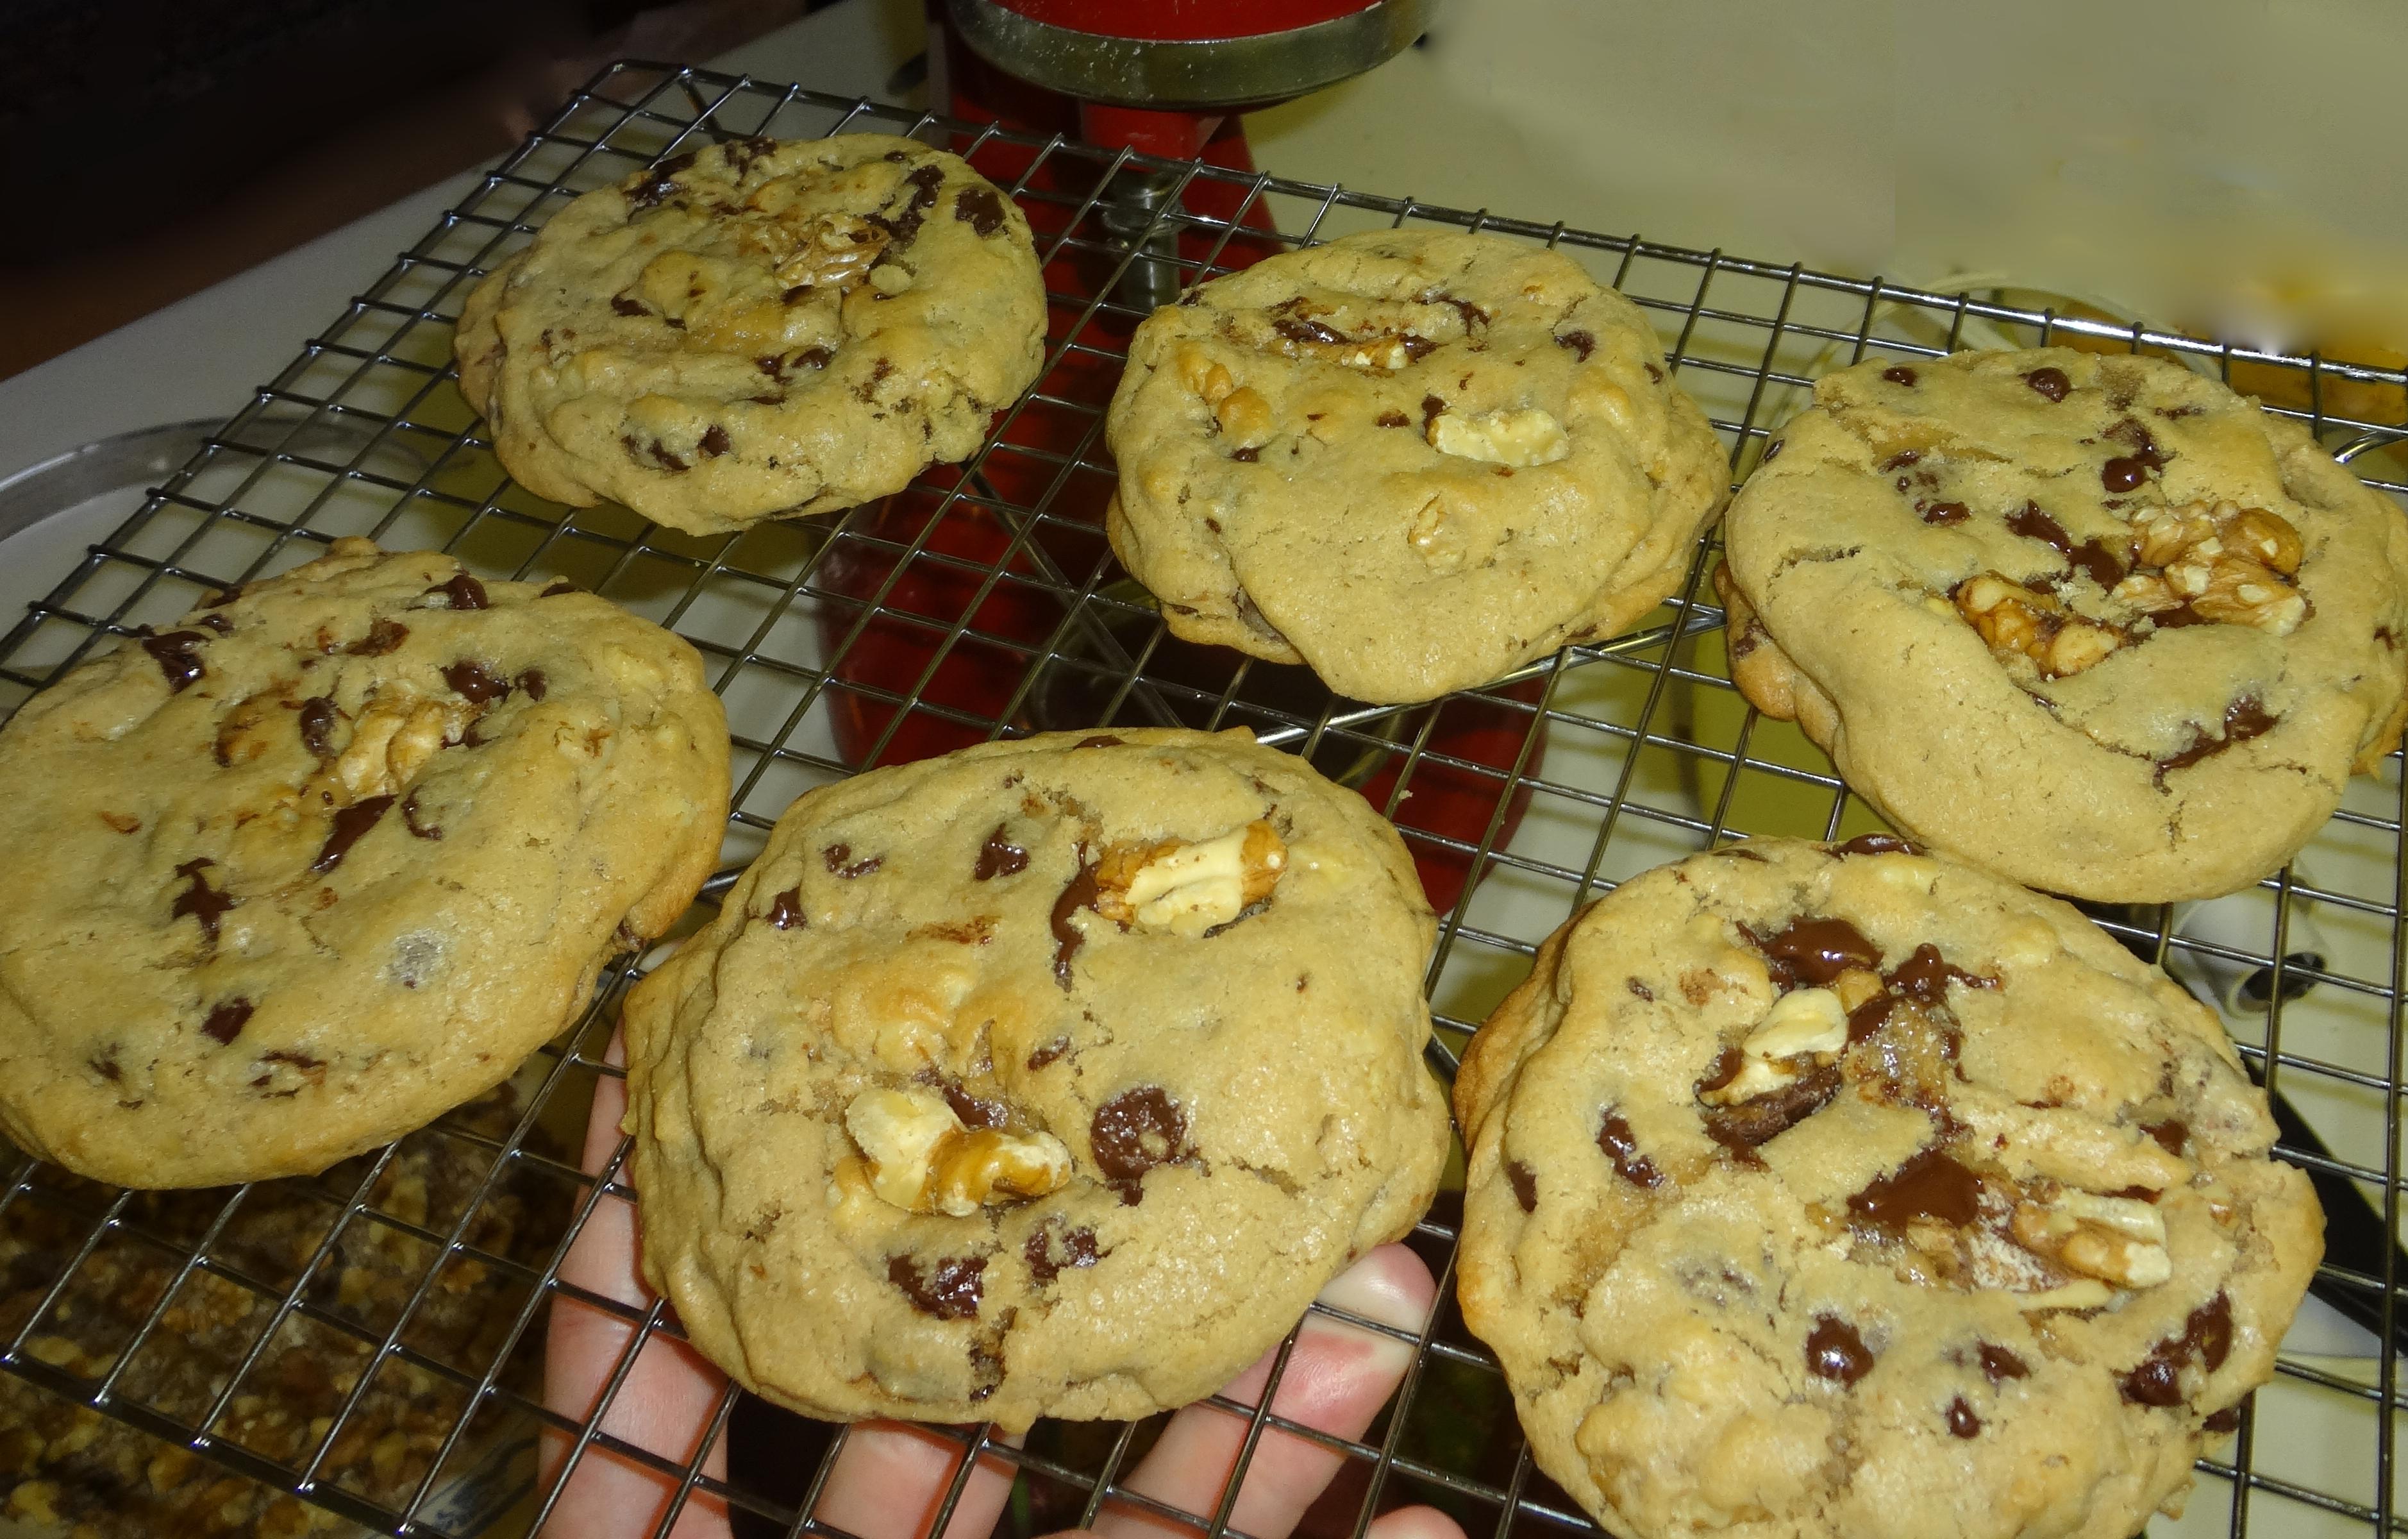 Chocolate chip walnuts 4-7-2013